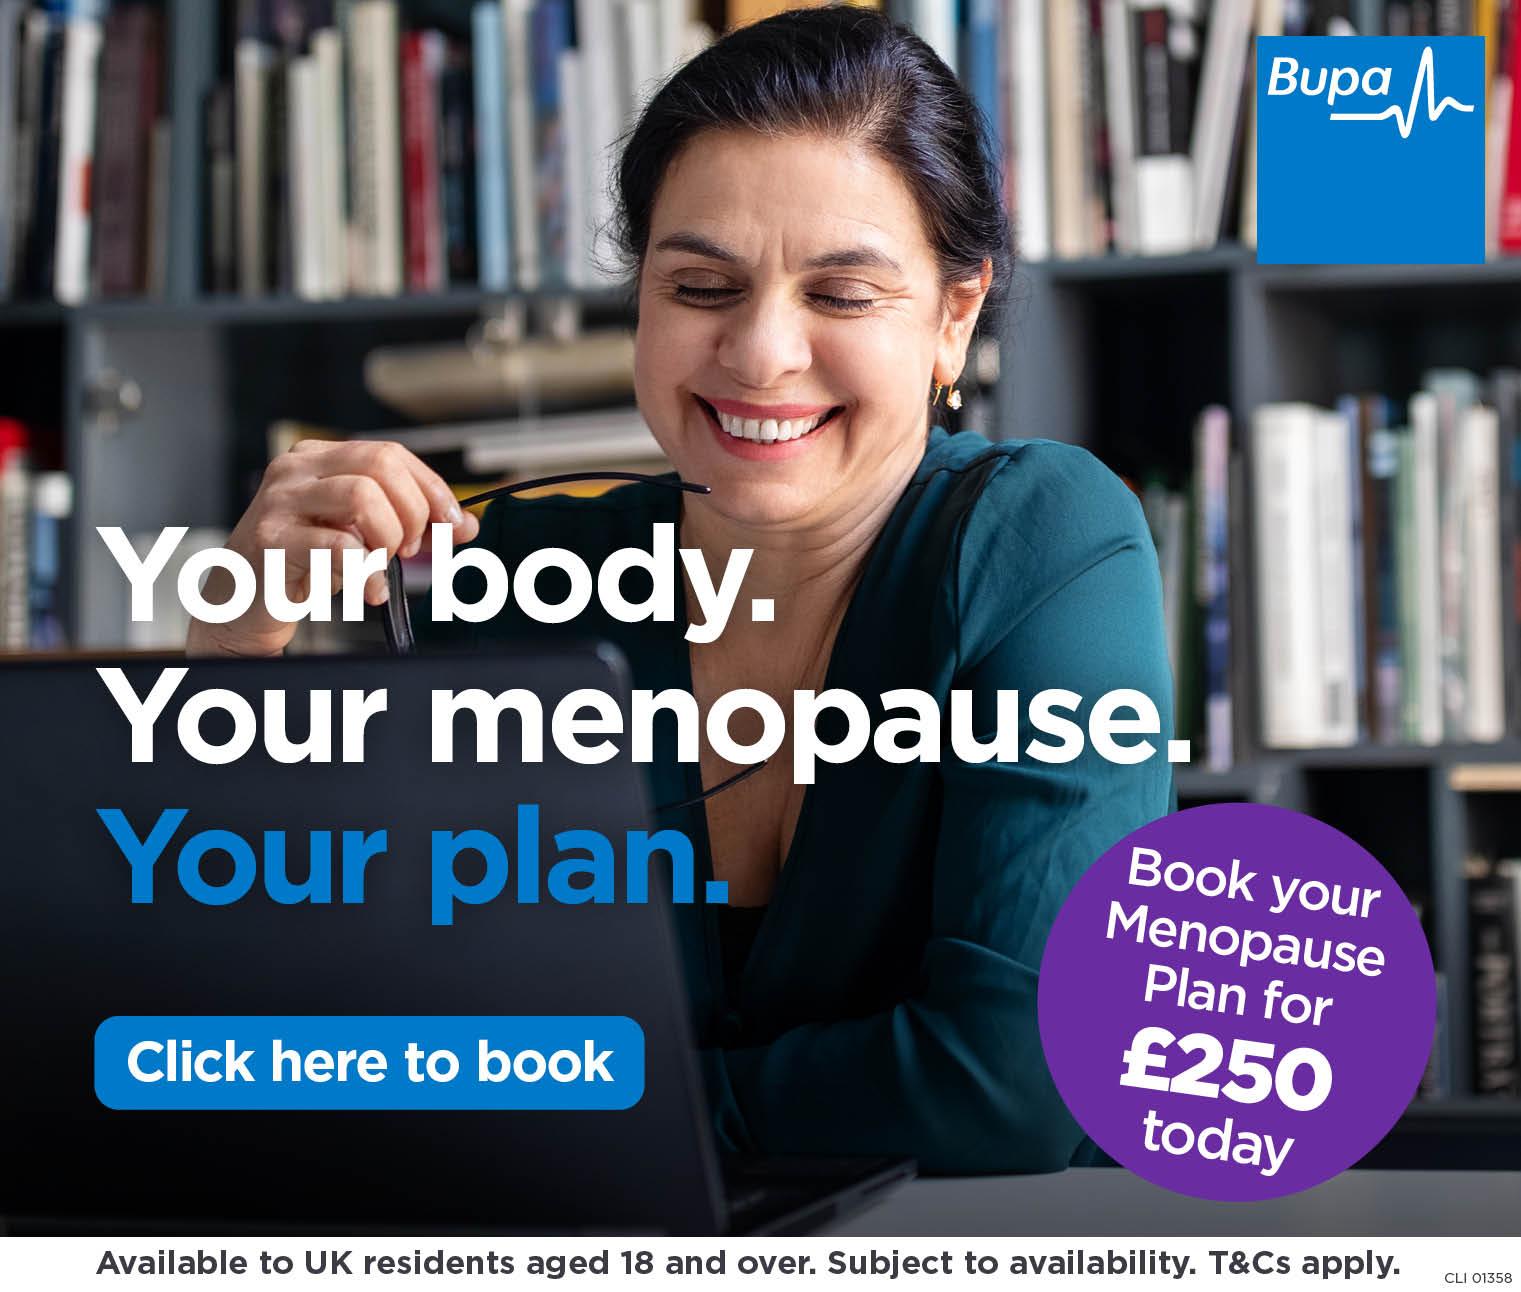 Bupa menopause plan 2